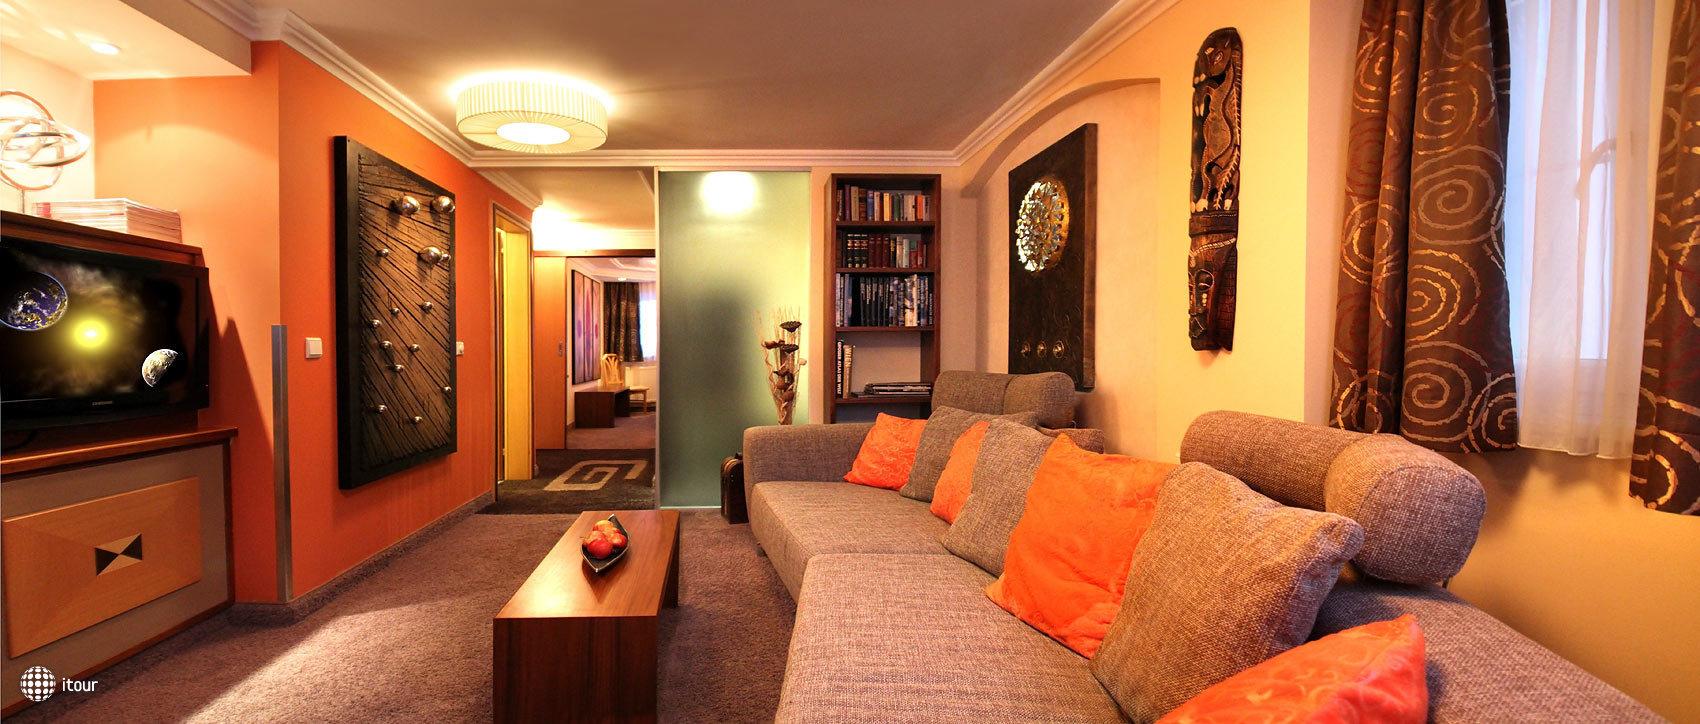 Gruetter Luxury Apartments 2